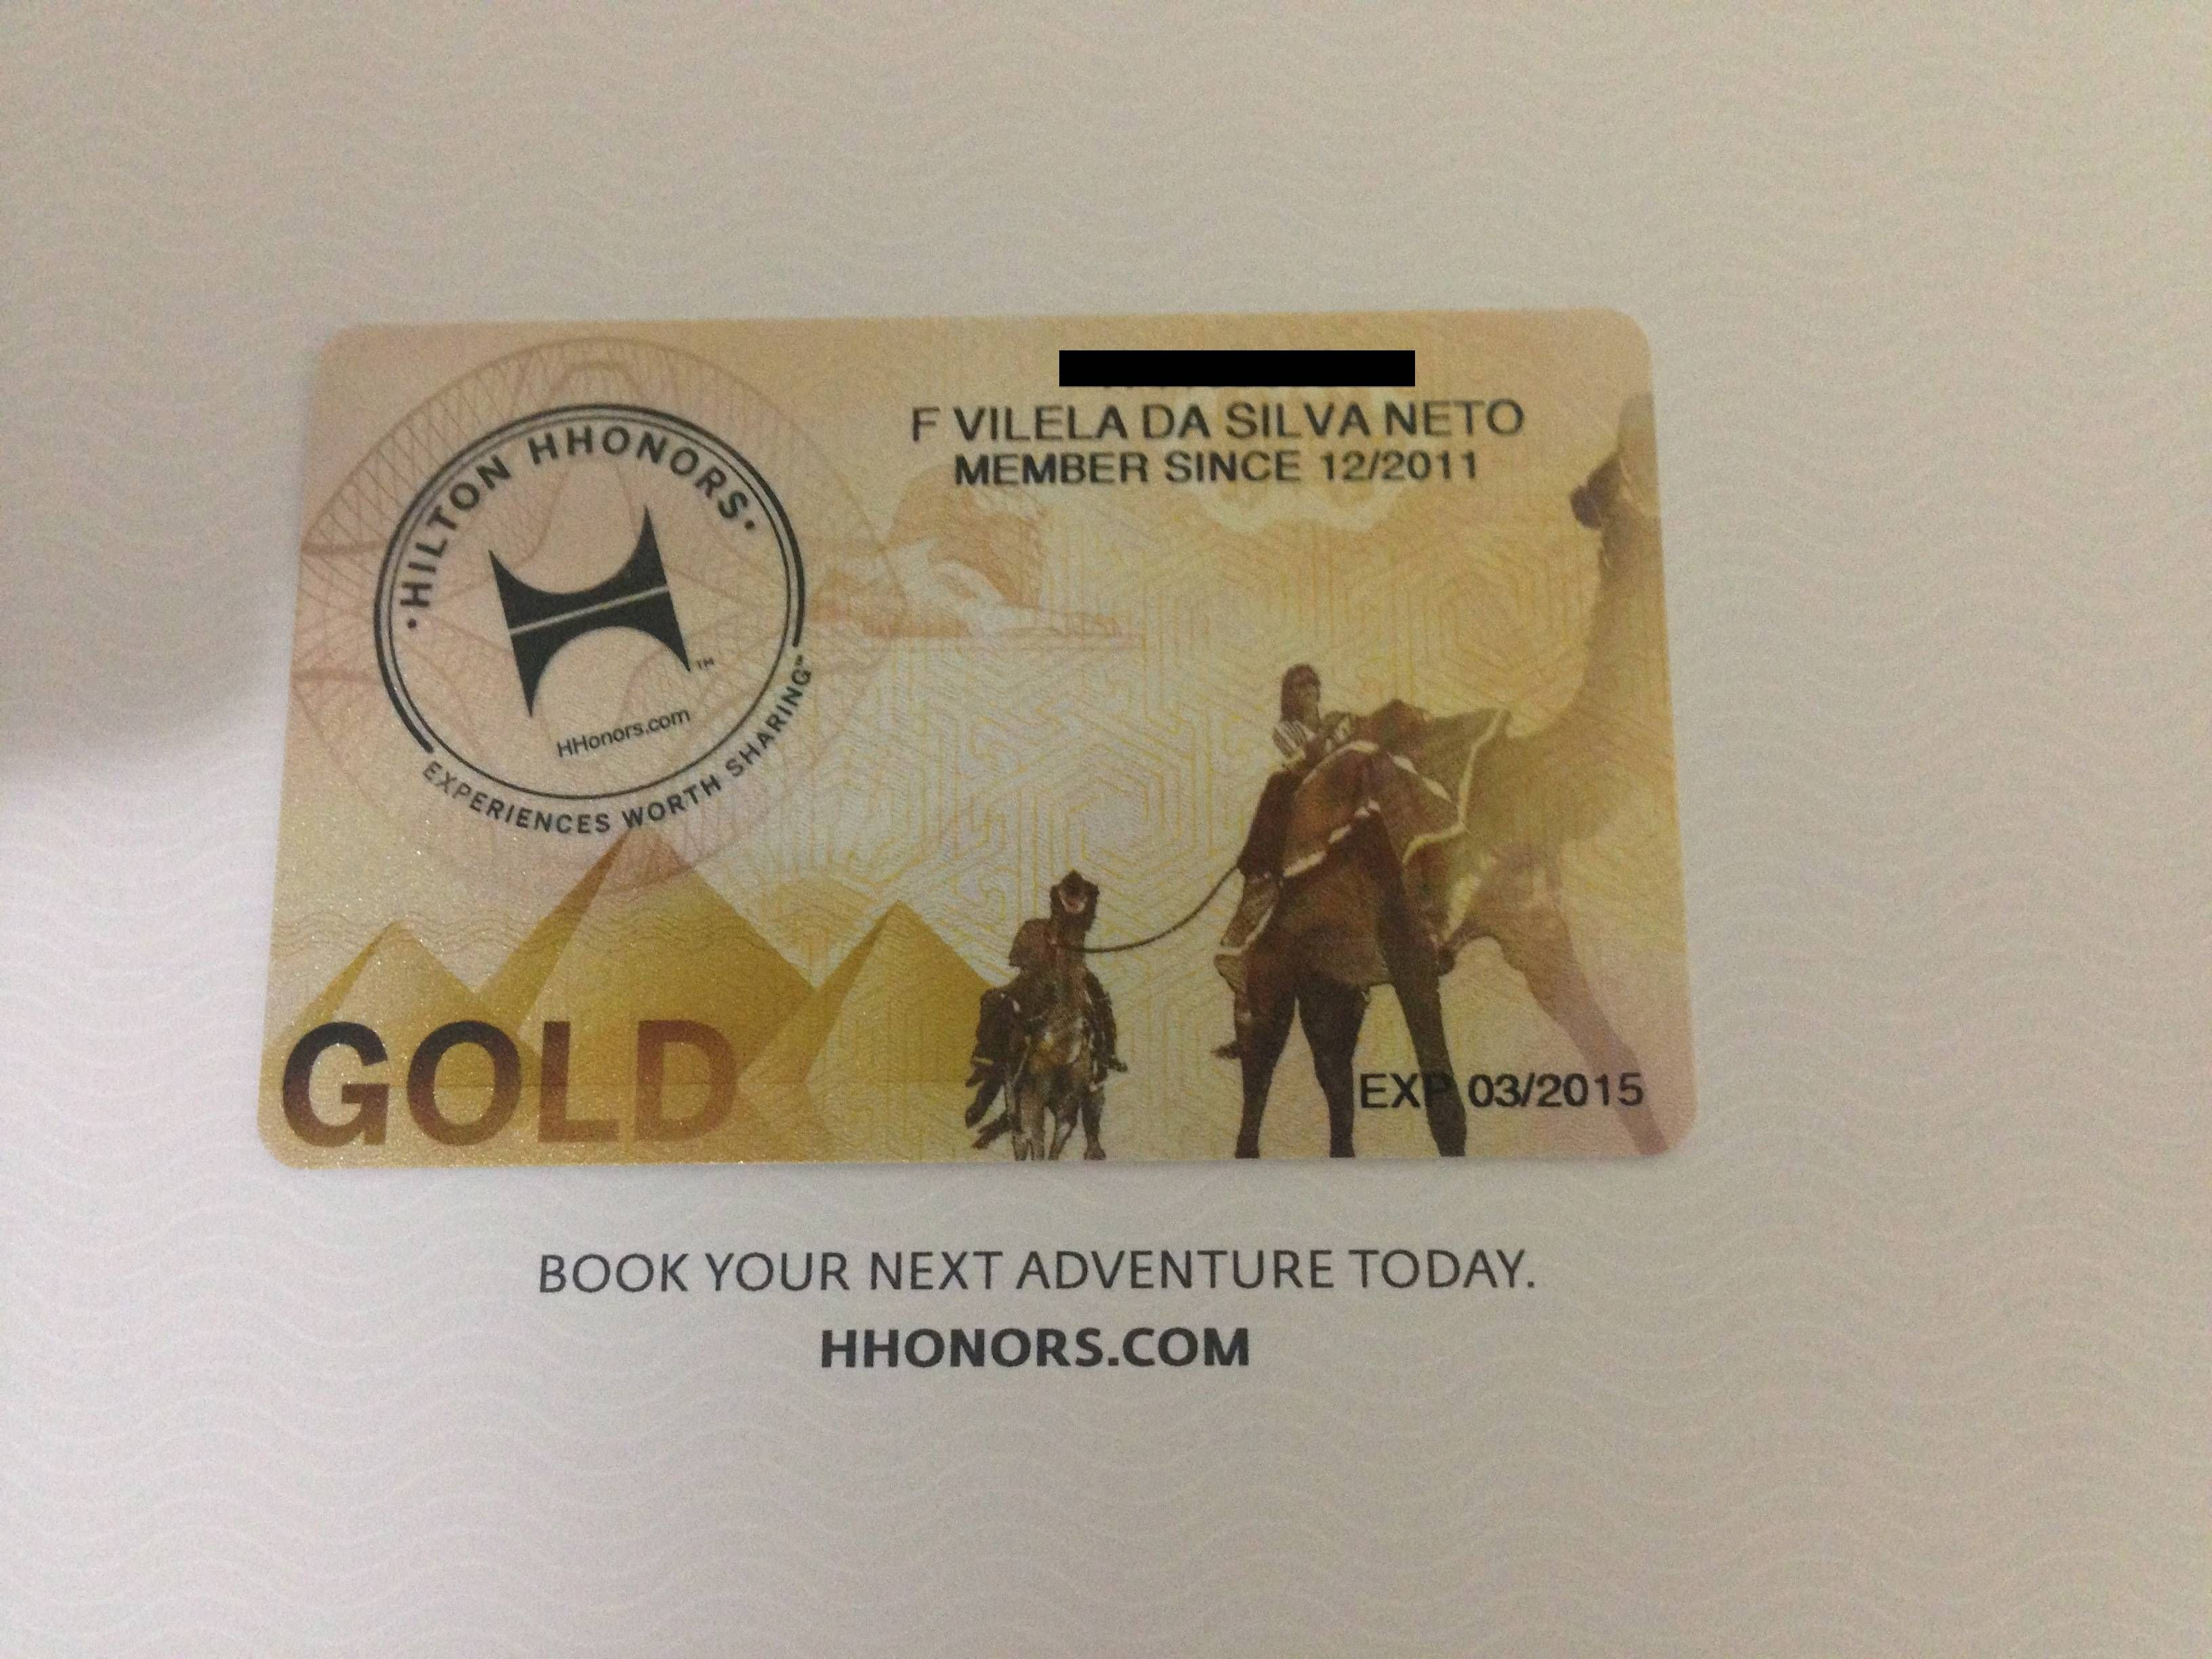 Kit de boas vindas do cartão HHonors Gold – Welcome Kit